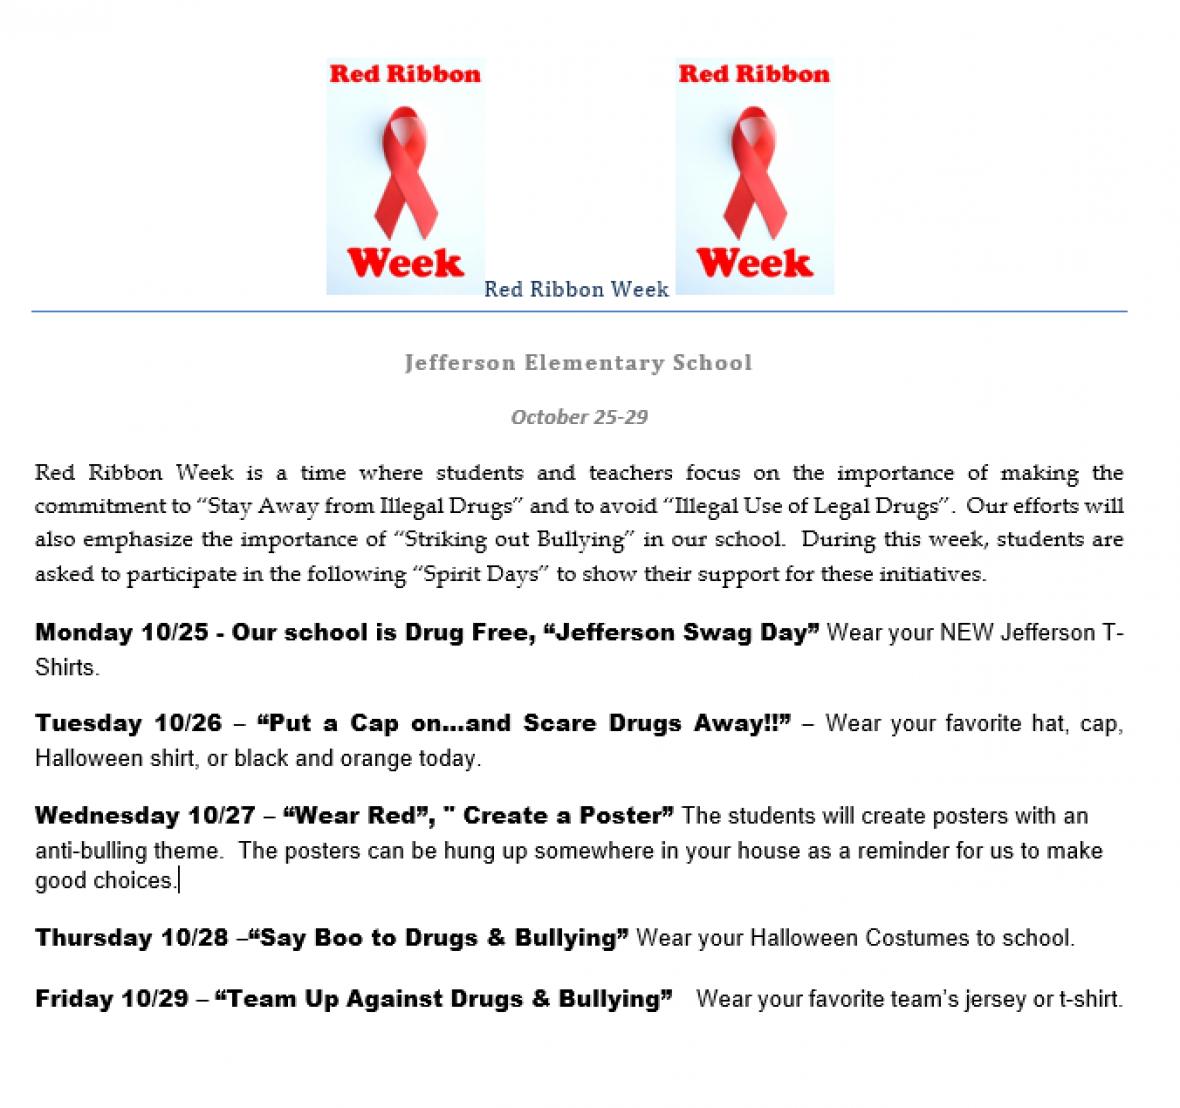 Red Ribbon Week at Jefferson